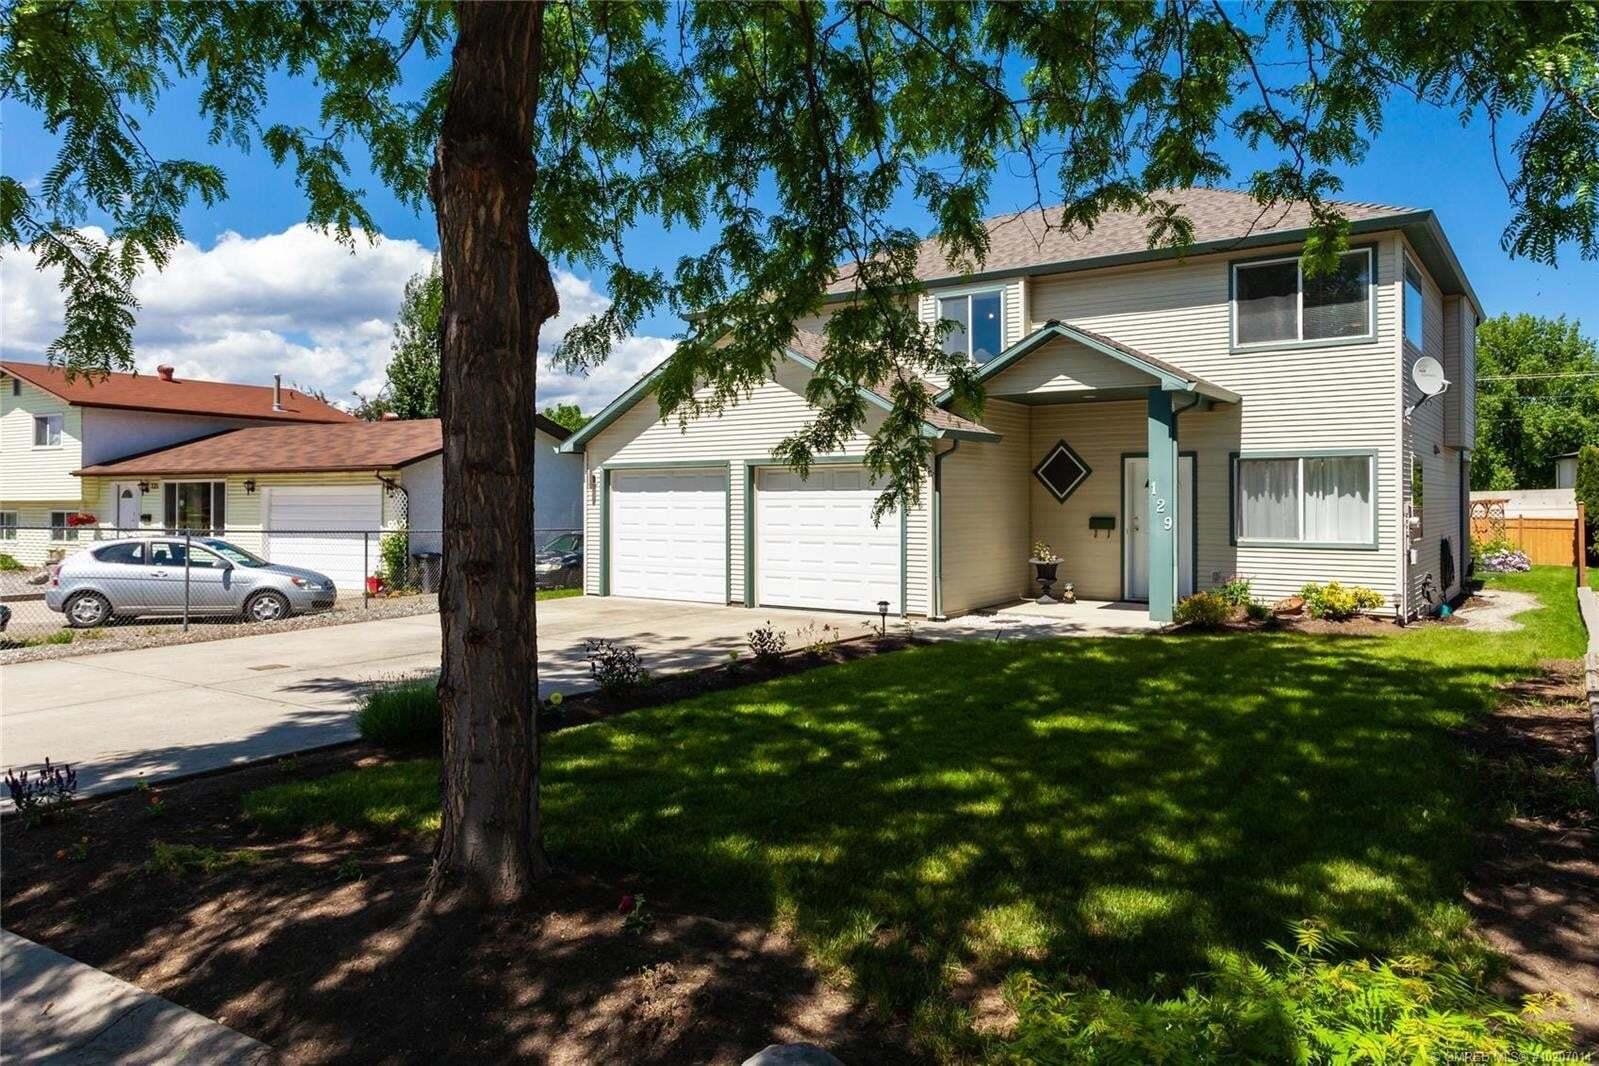 House for sale at 129 Brighton Rd Kelowna British Columbia - MLS: 10207014